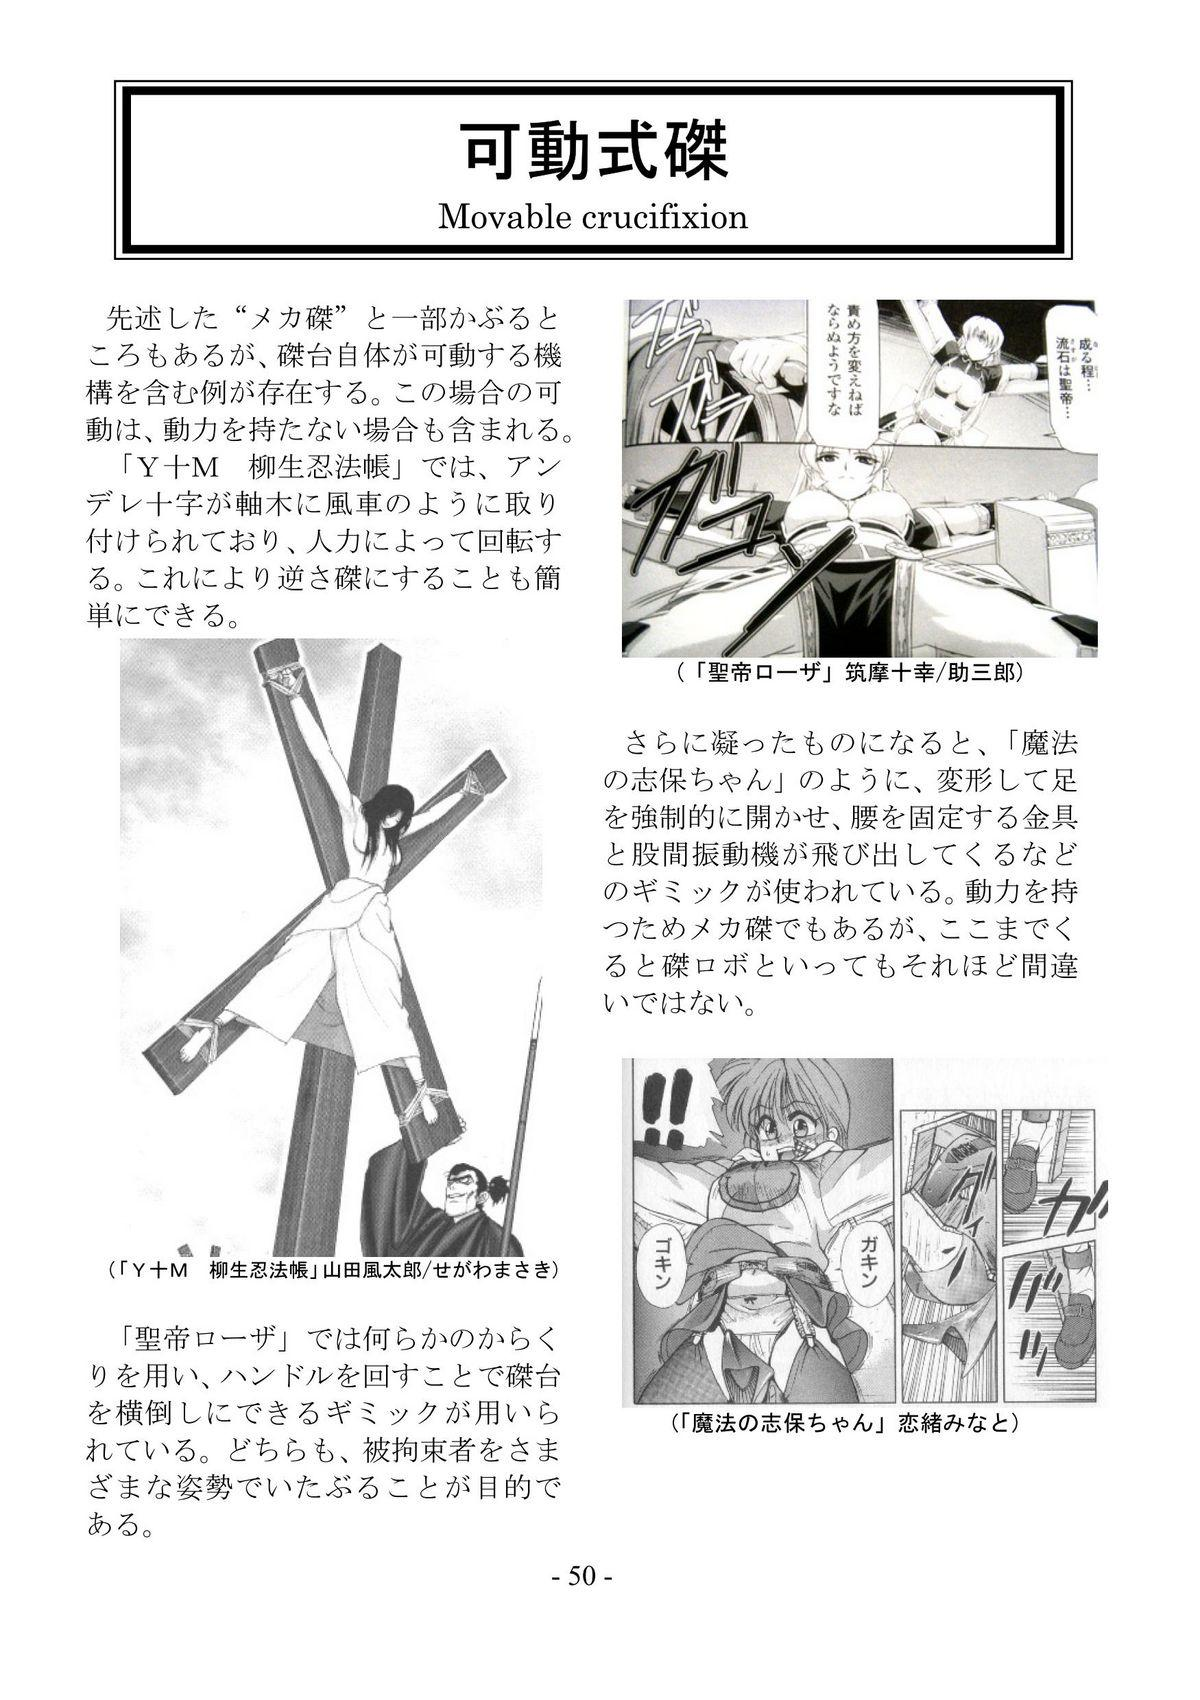 encyclopedia of crucifixion 50